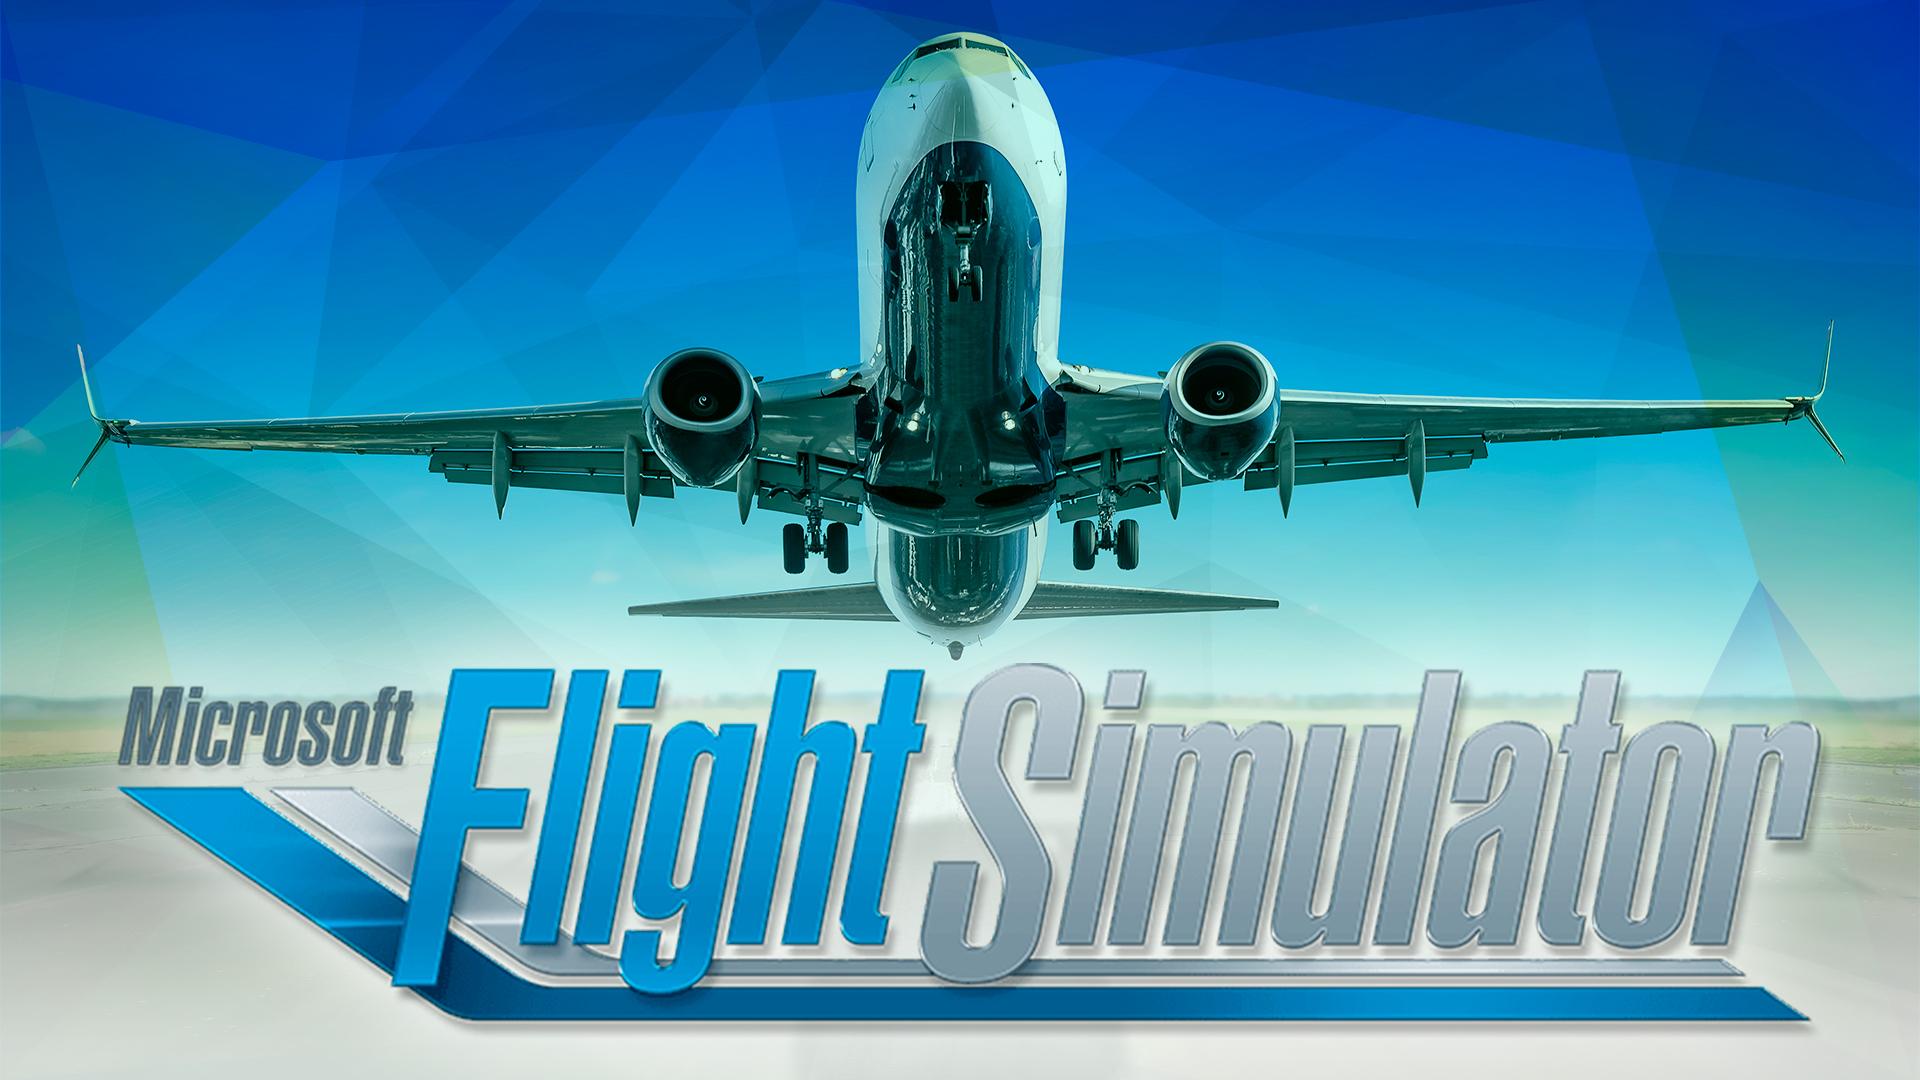 Logo, Flugzeug, flugsimulation, Flight Simulator 2020, Flight Simulator, Microsoft Flight Simulator, Flugsimulator, Microsoft Flight Simulator 2020, FlightSim, Microsoft Flugsimulator Update, Microsoft Flight Simulator Update, FS, MSFT FS, Jet